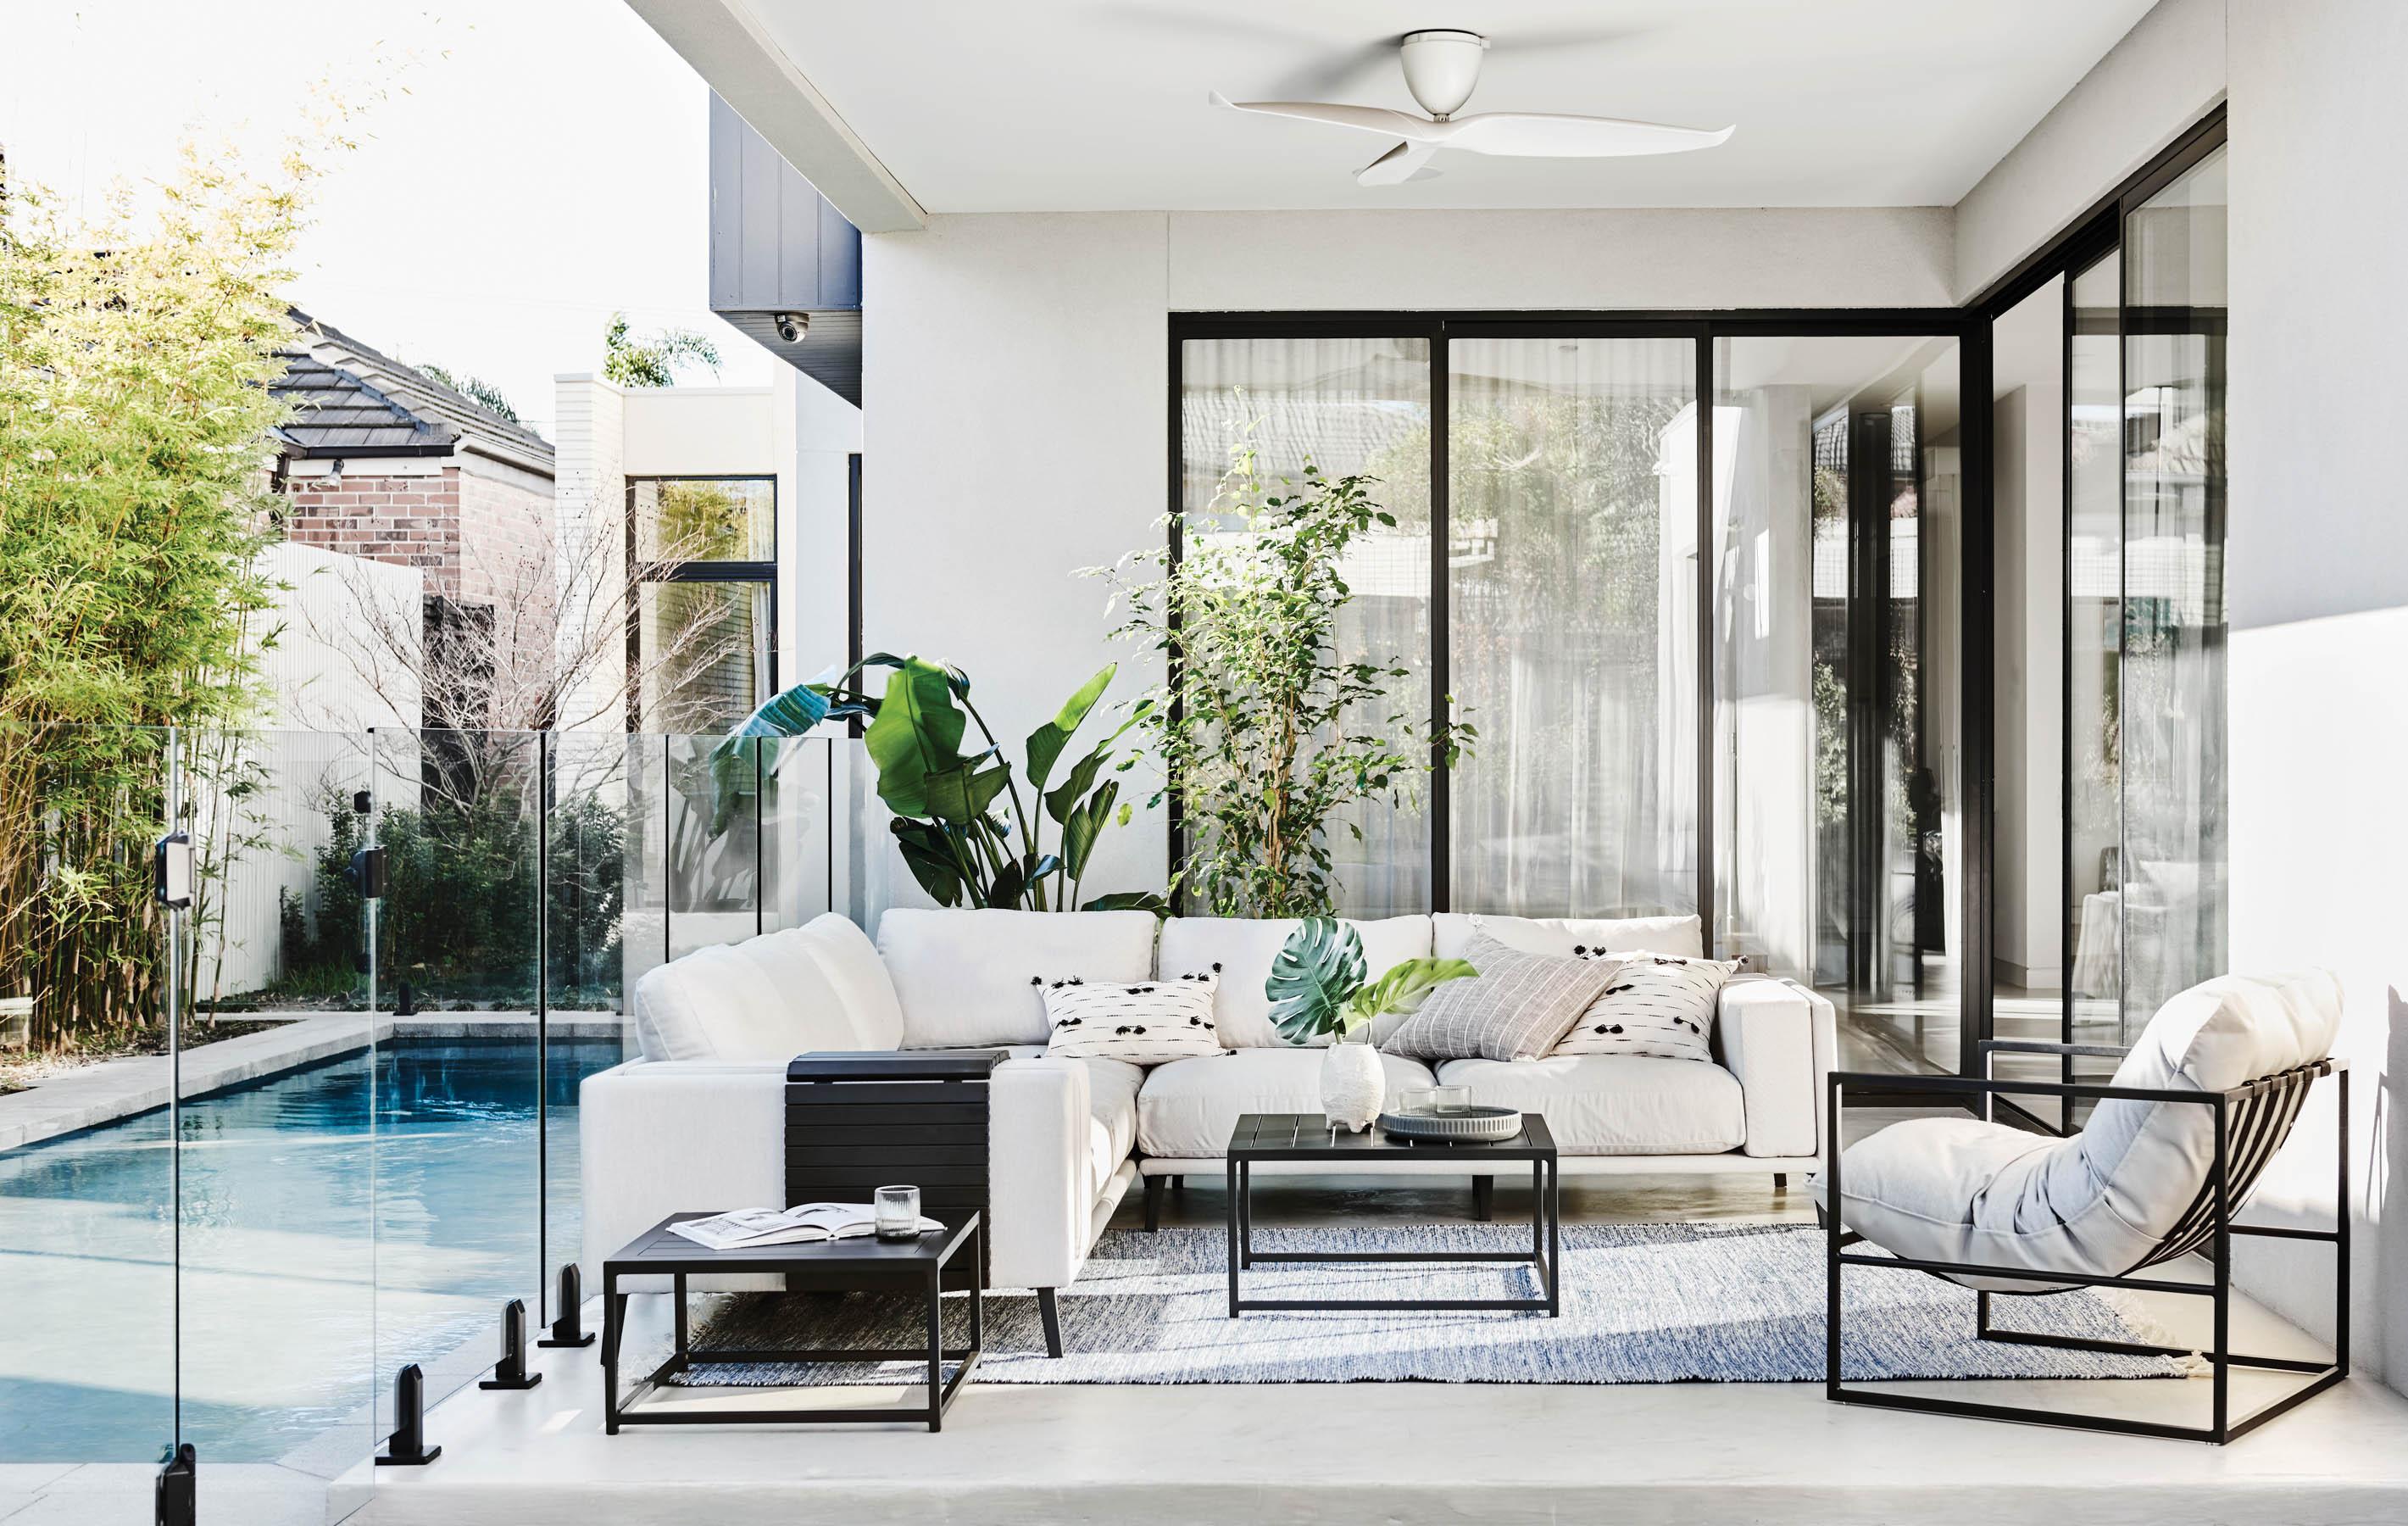 Furniture Gallery Sofas aruba-square-two-seater-01